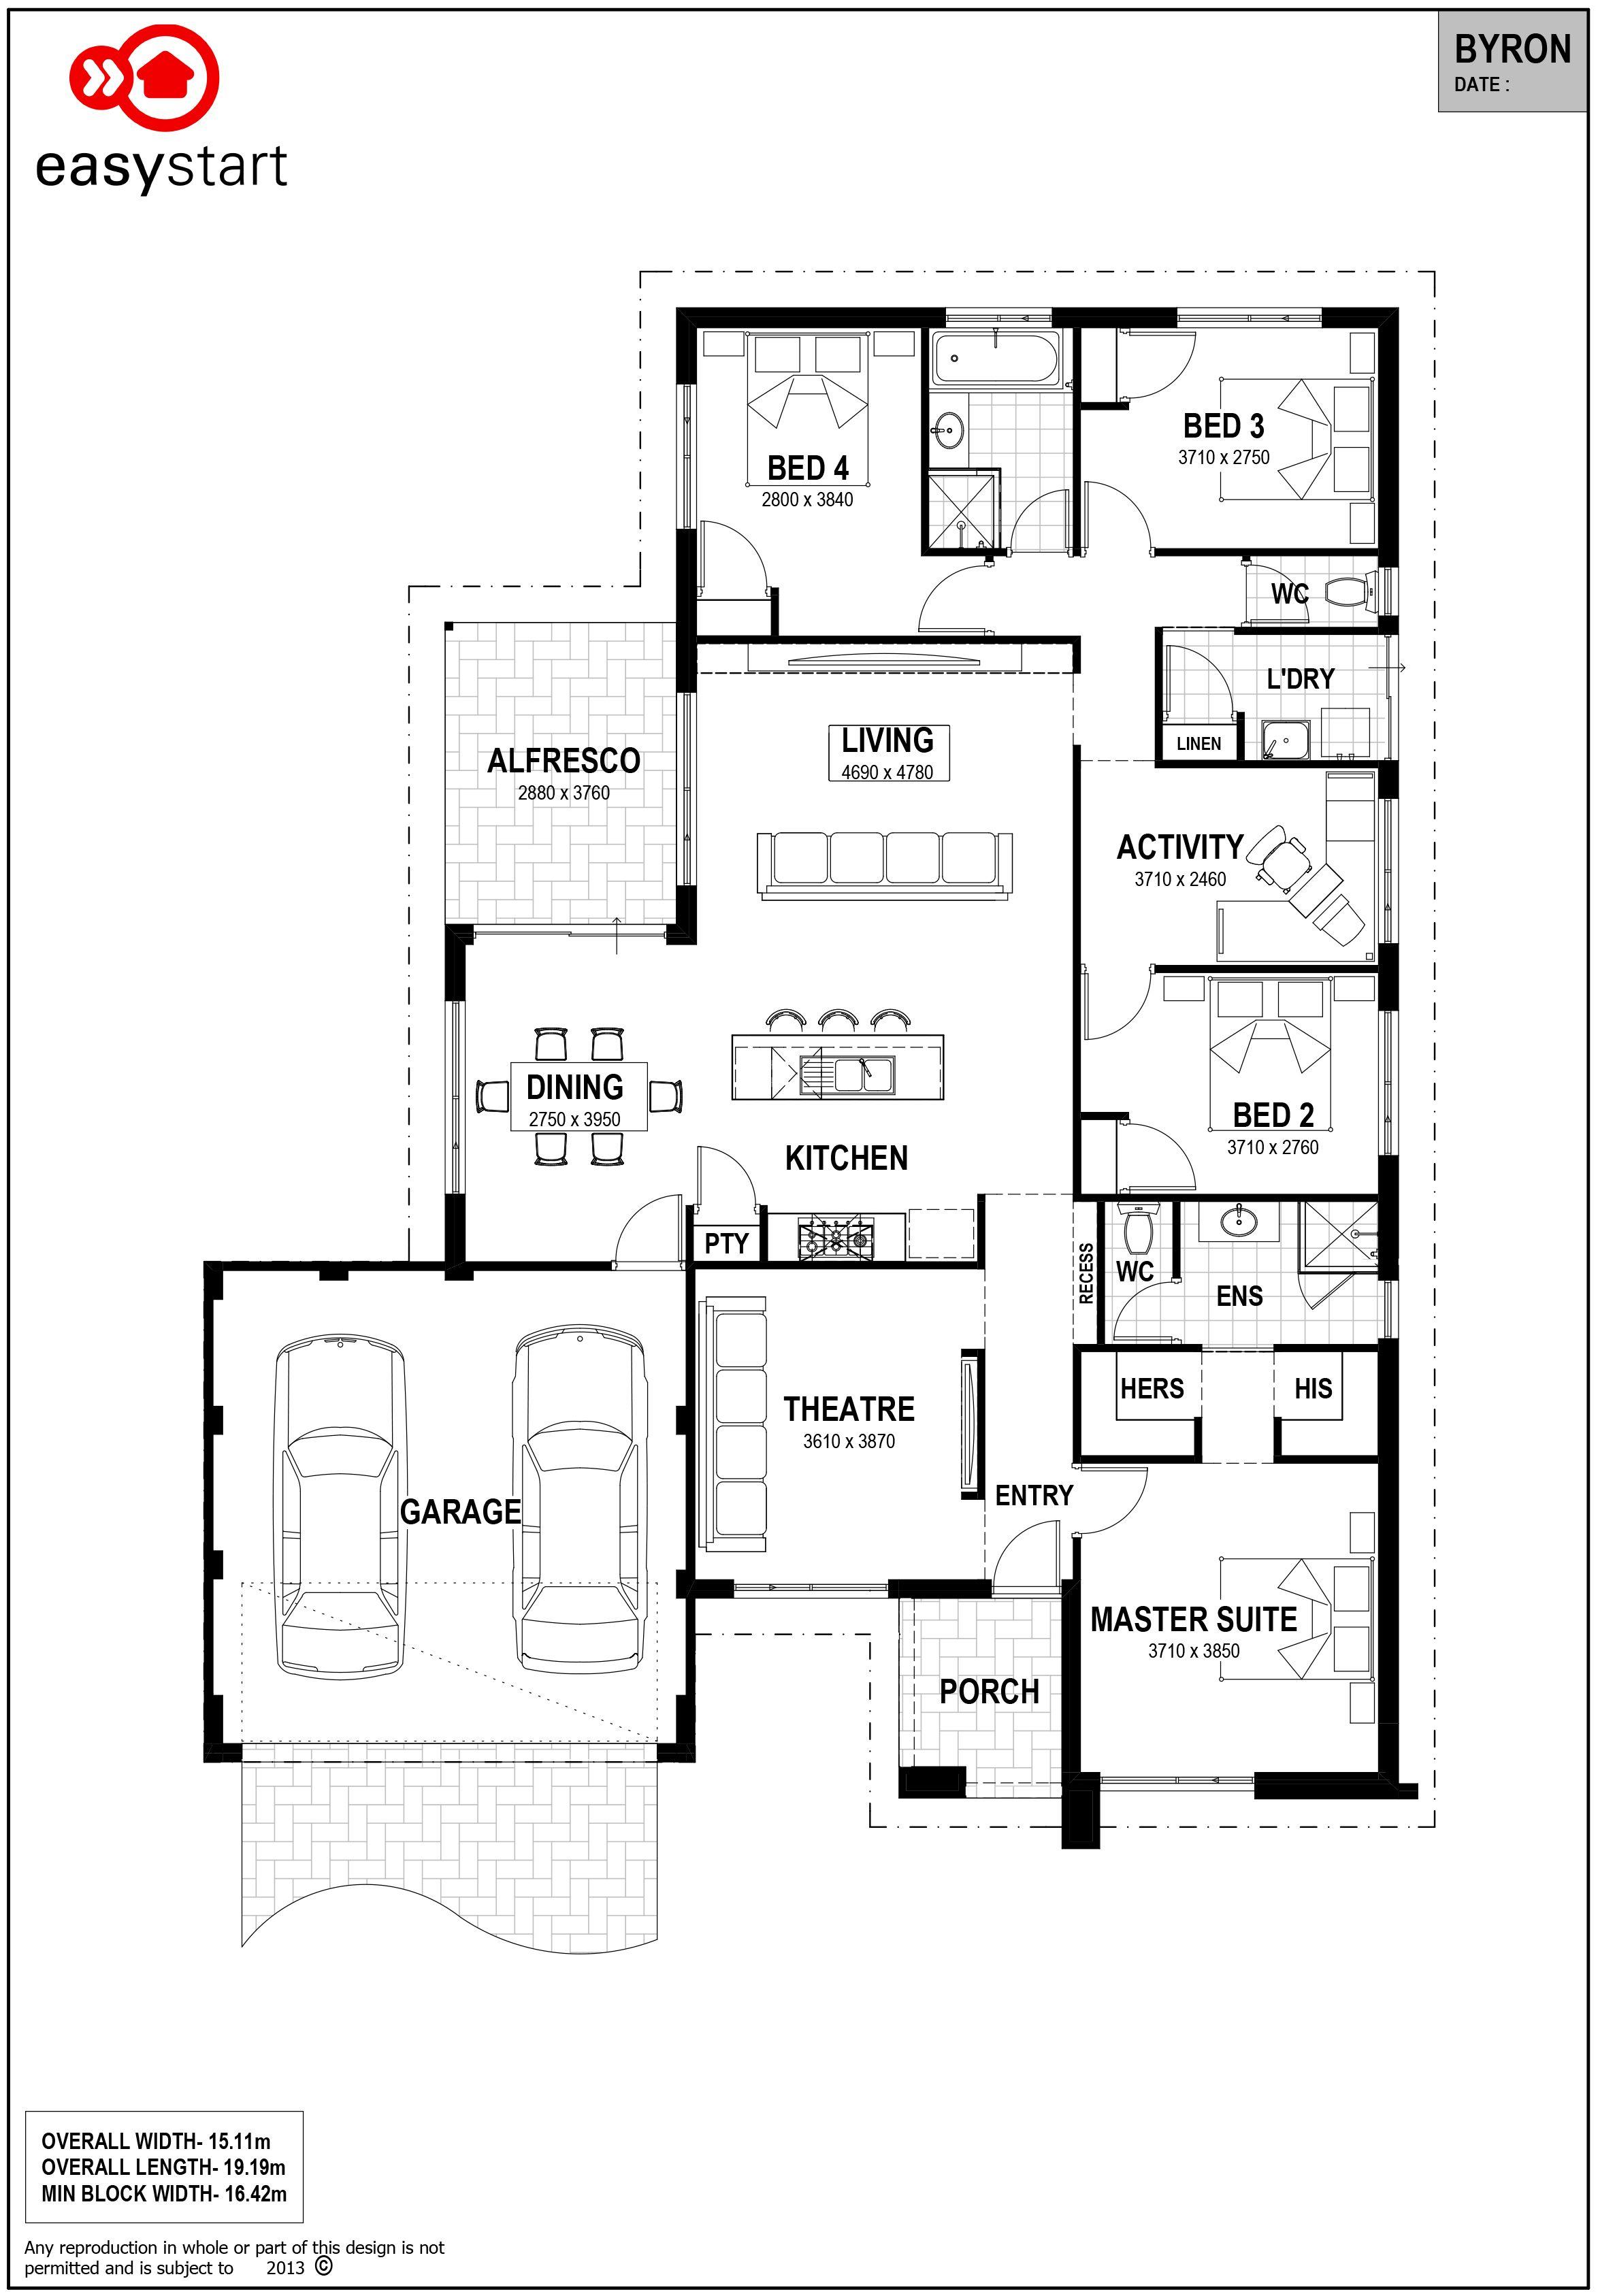 Byron Easystart Home Designs Perth House design